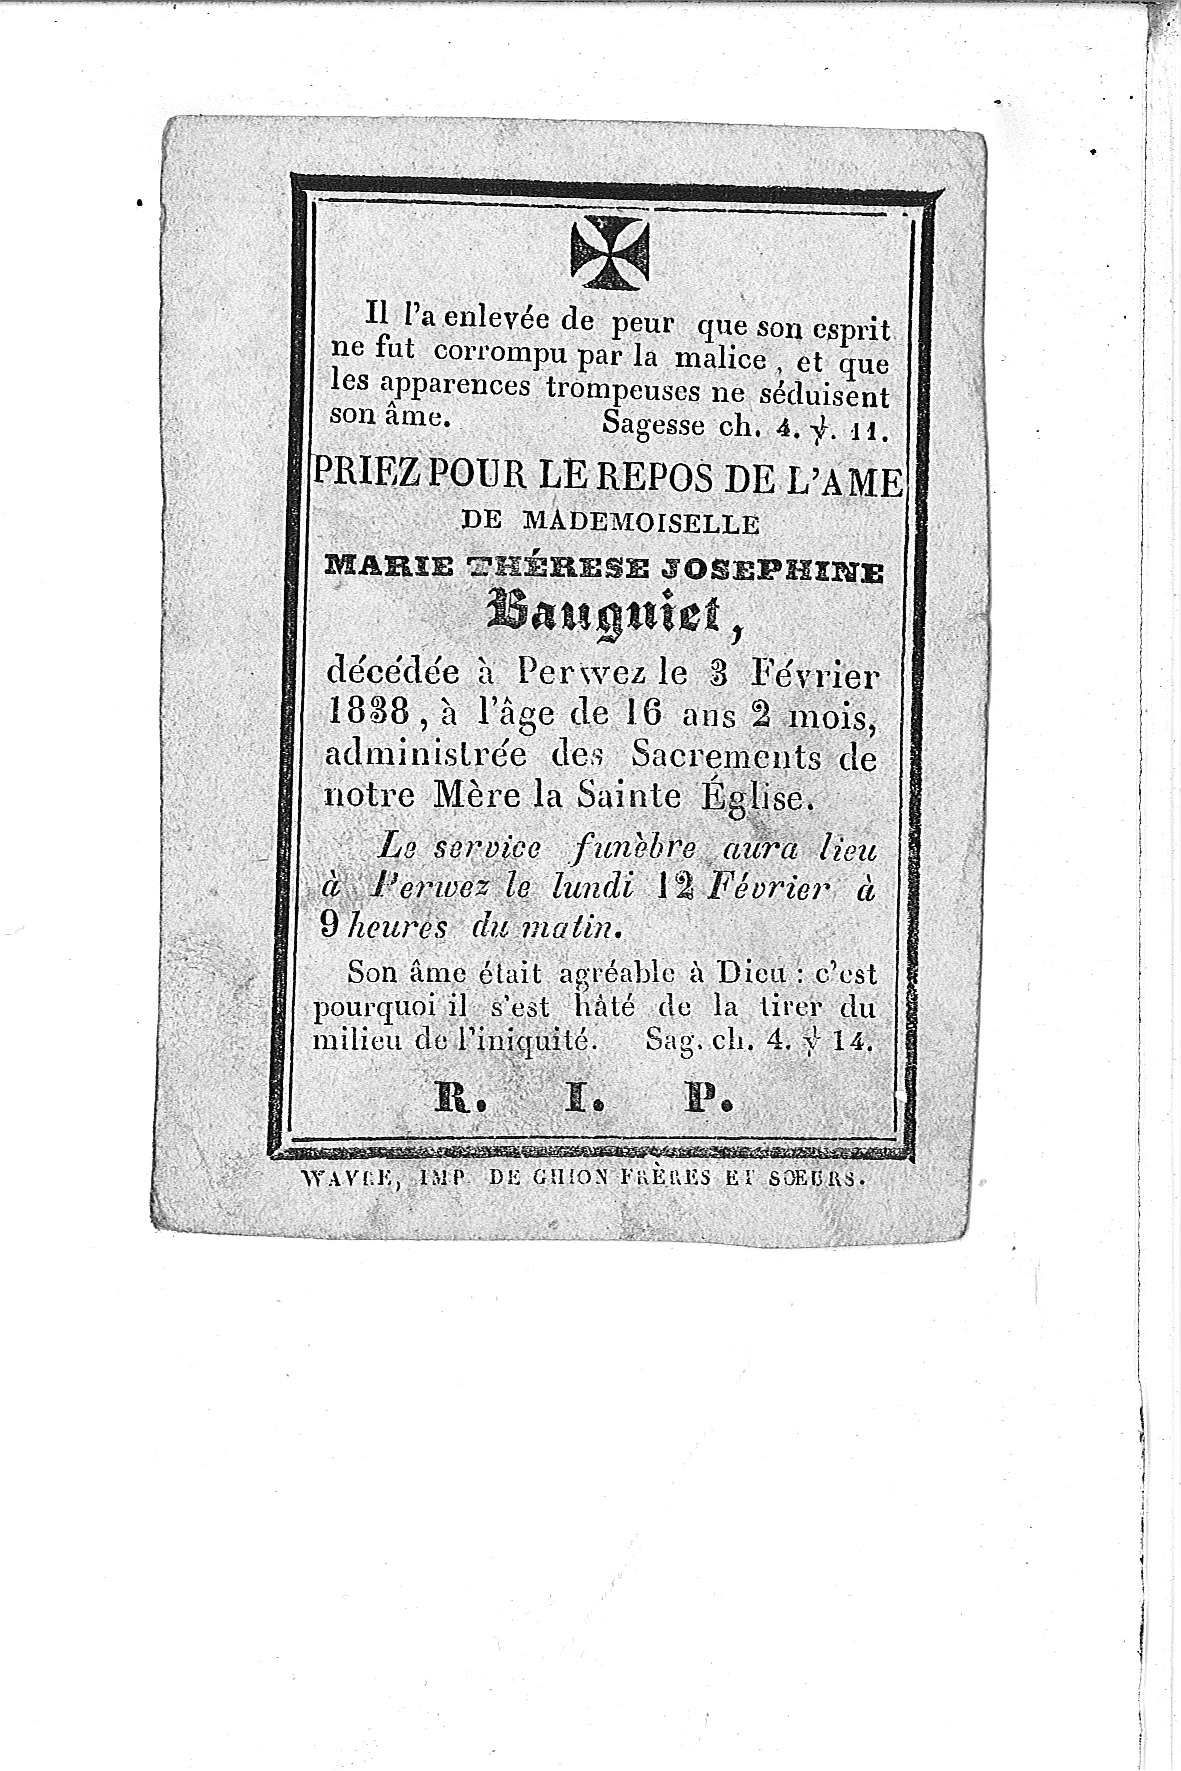 Marie-Thérèse-Josephine(1838)20101025084357_00012.jpg